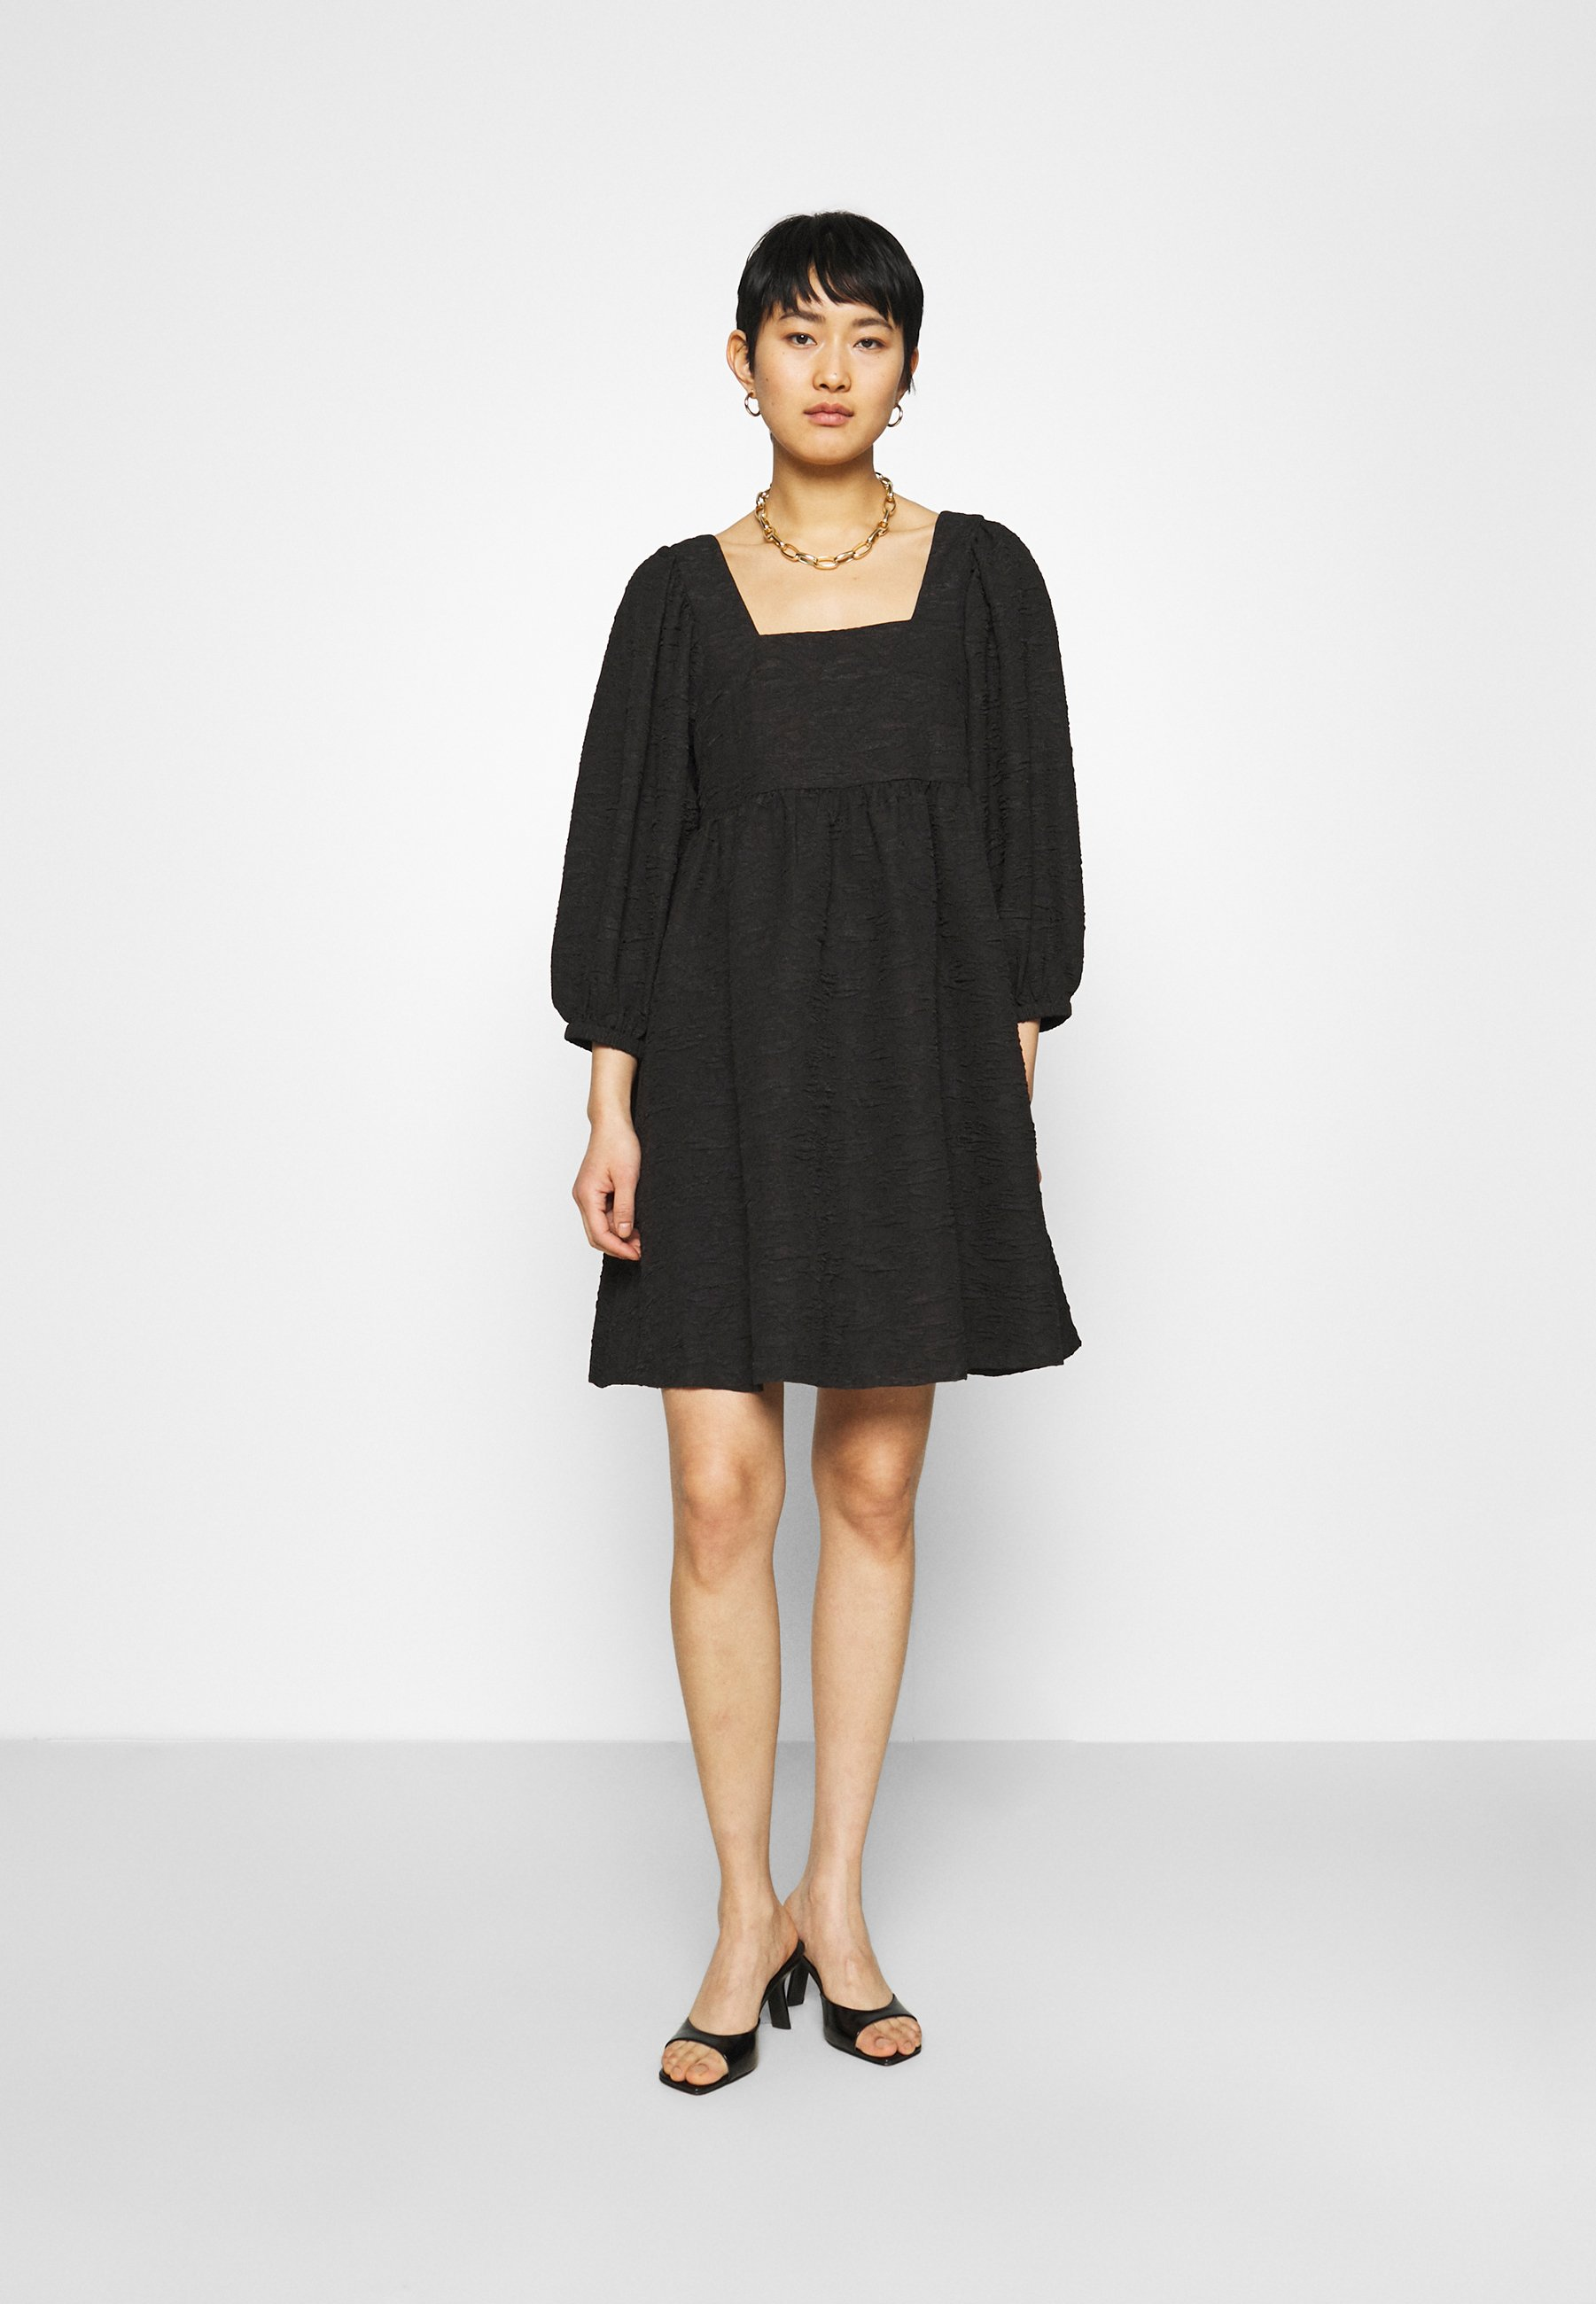 Femme TODA DRESS - Robe de soirée